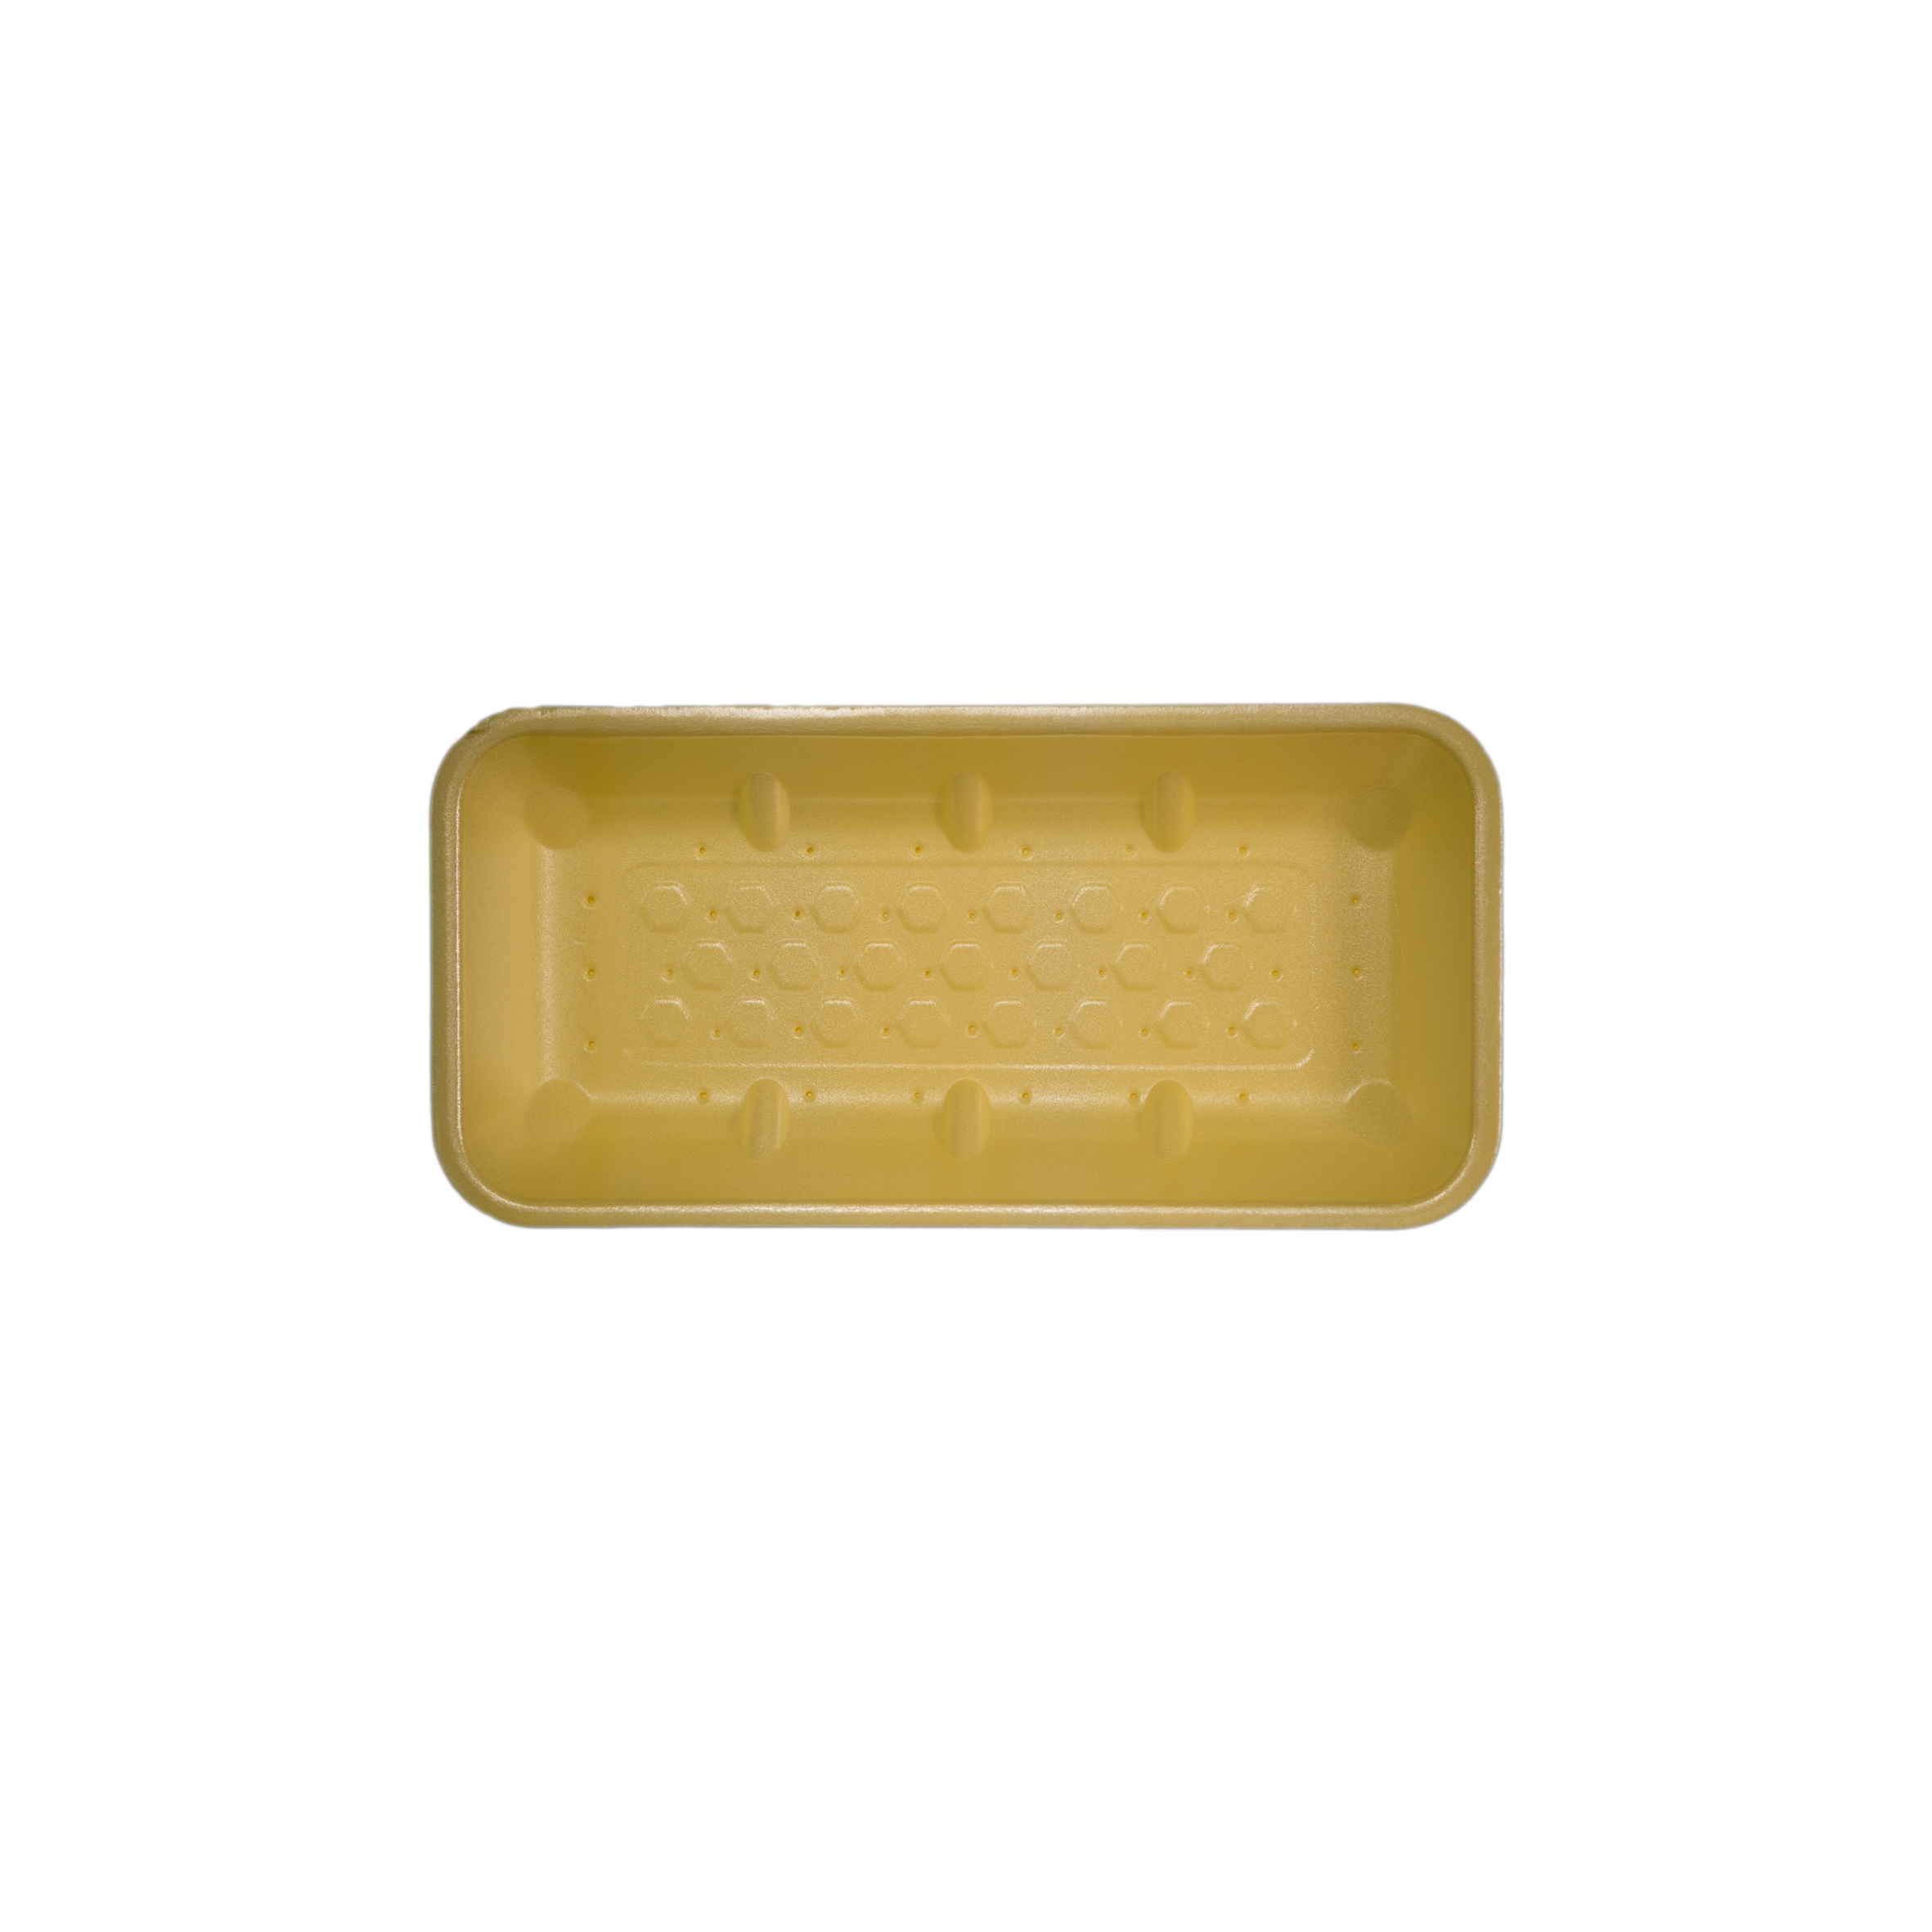 iK0116      OPEN CELL 35mm 11x5 yellow    90 per sleeve 360 per carton